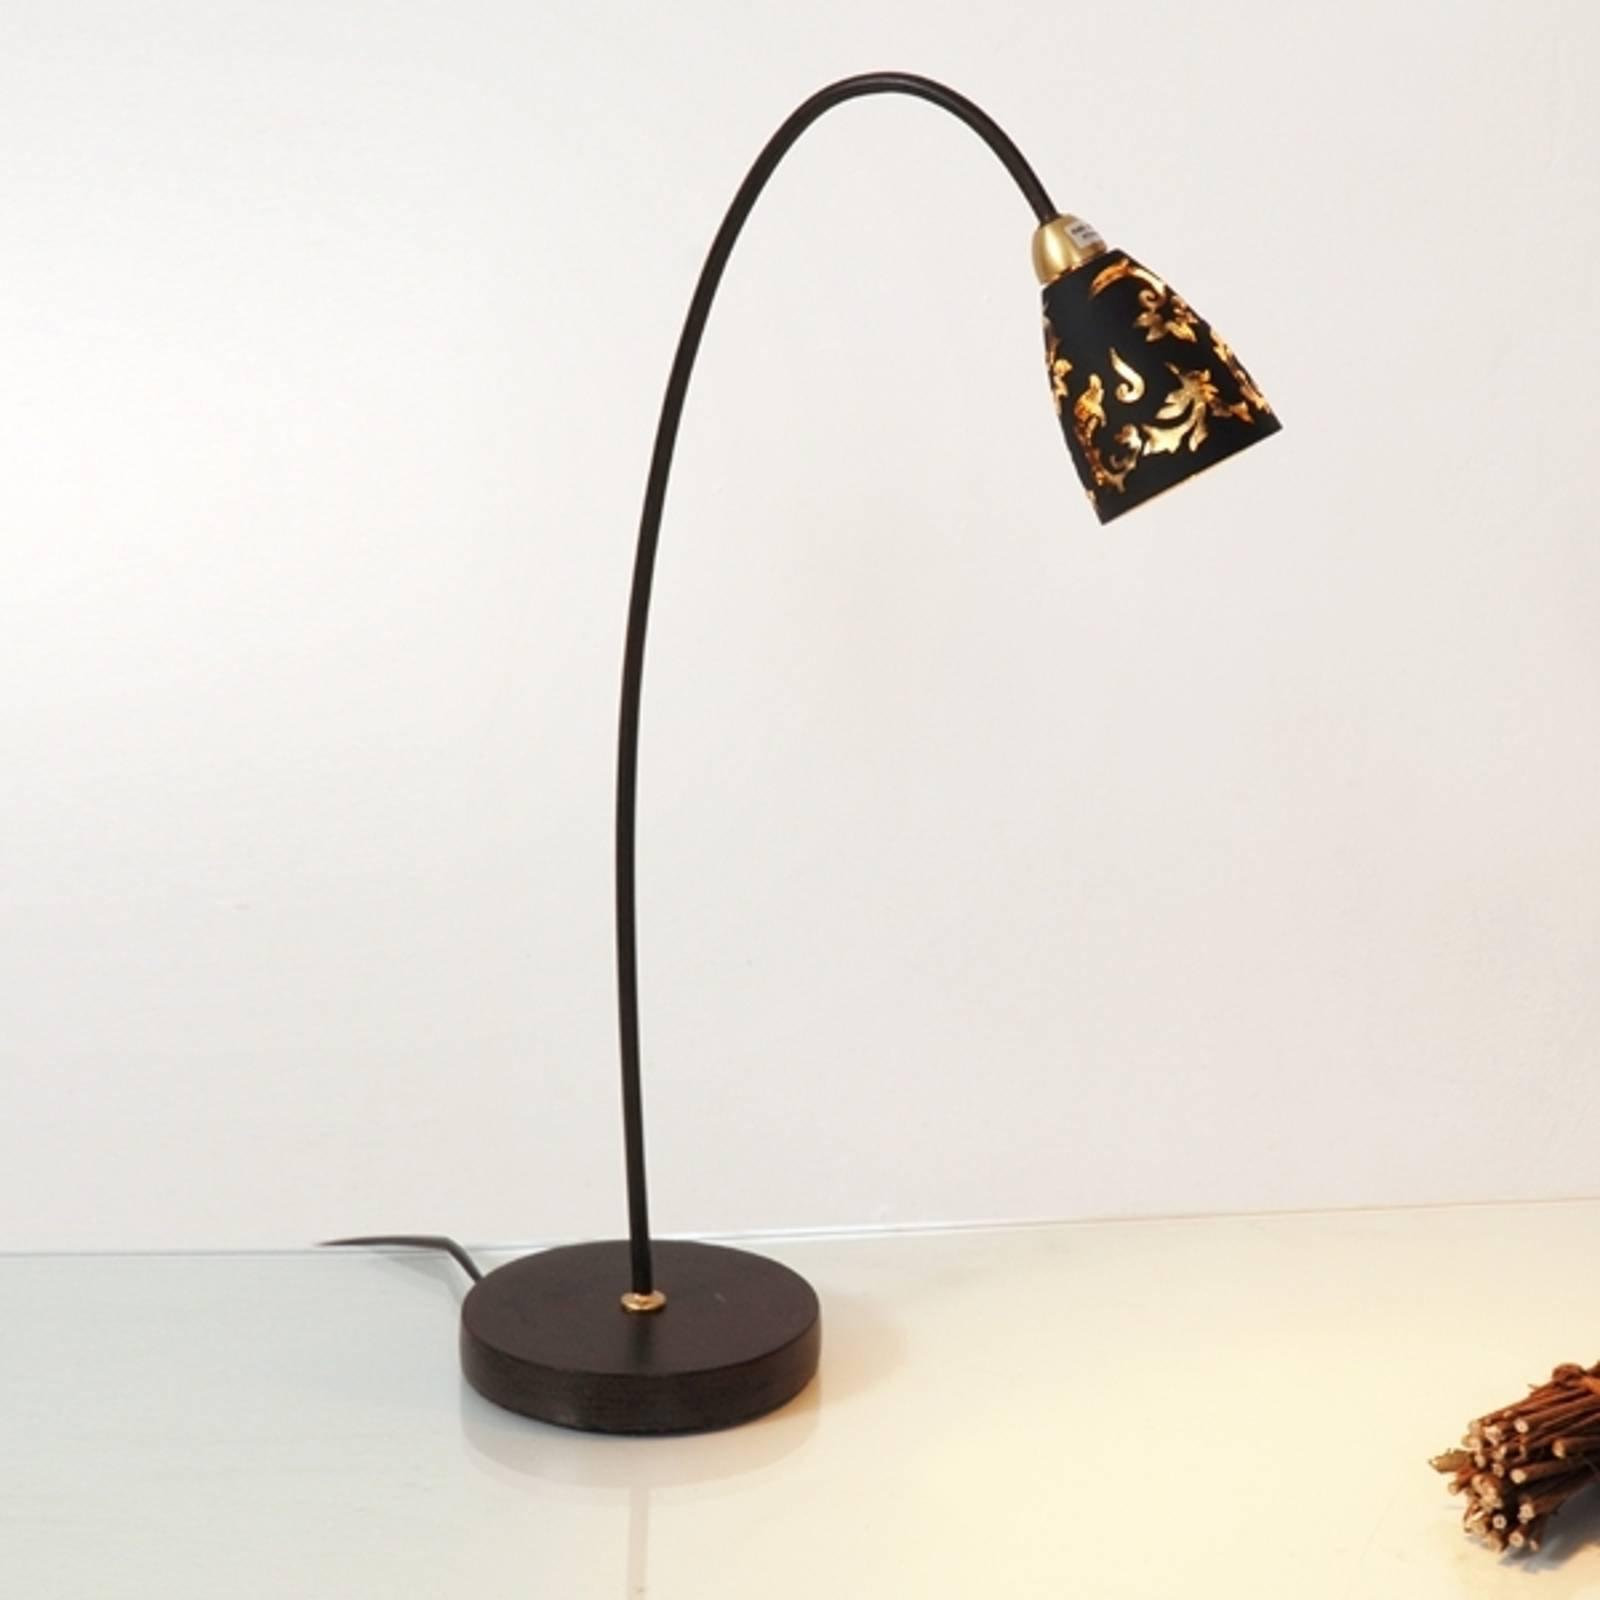 Verdifull bordlampe Alice, skjerm svart gull